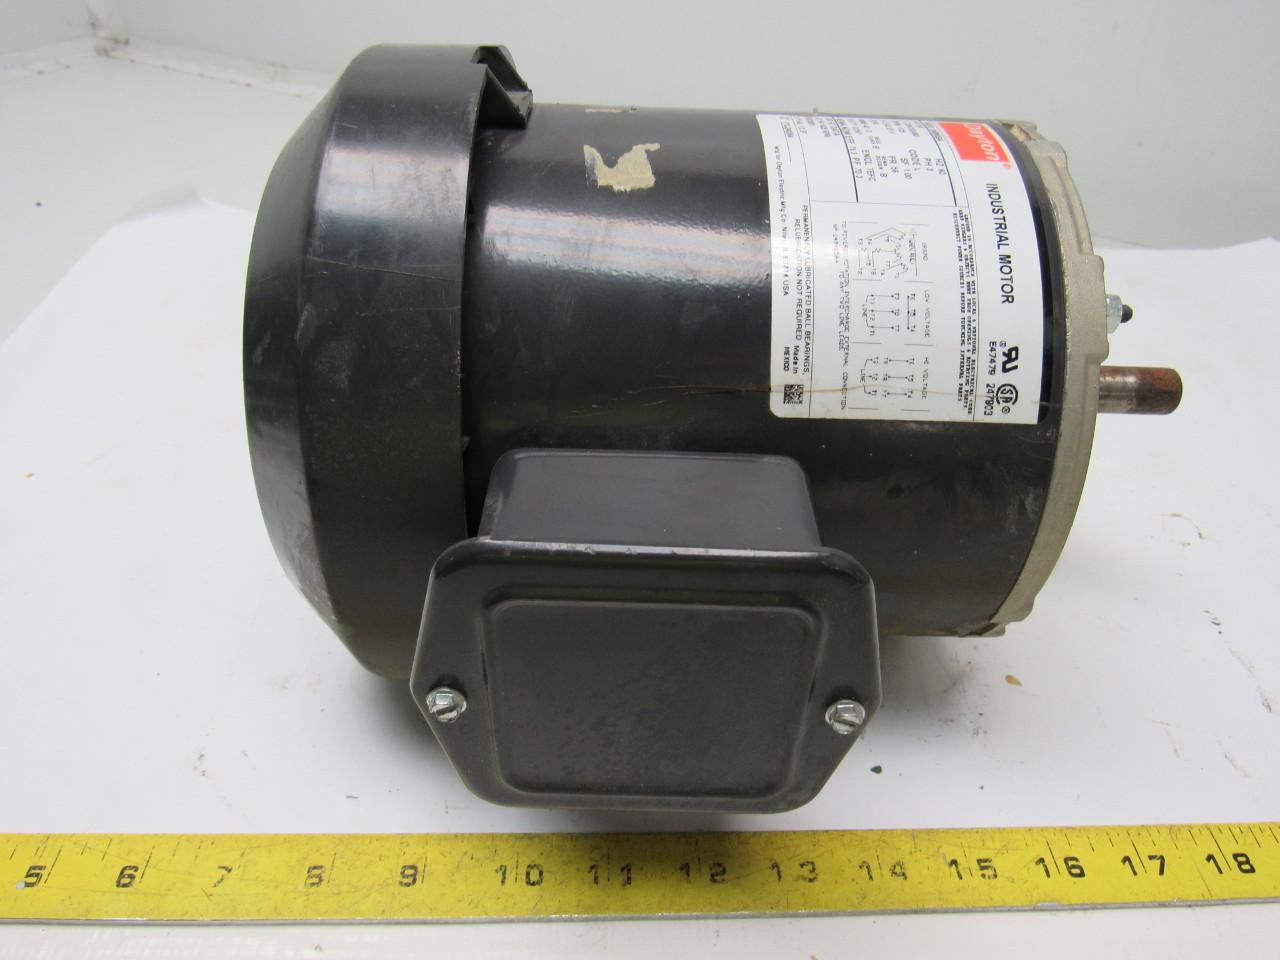 Dayton 2n866ba electric motor 3 4 hp 208 230 460v 3 phase for 10 hp single phase motor amps